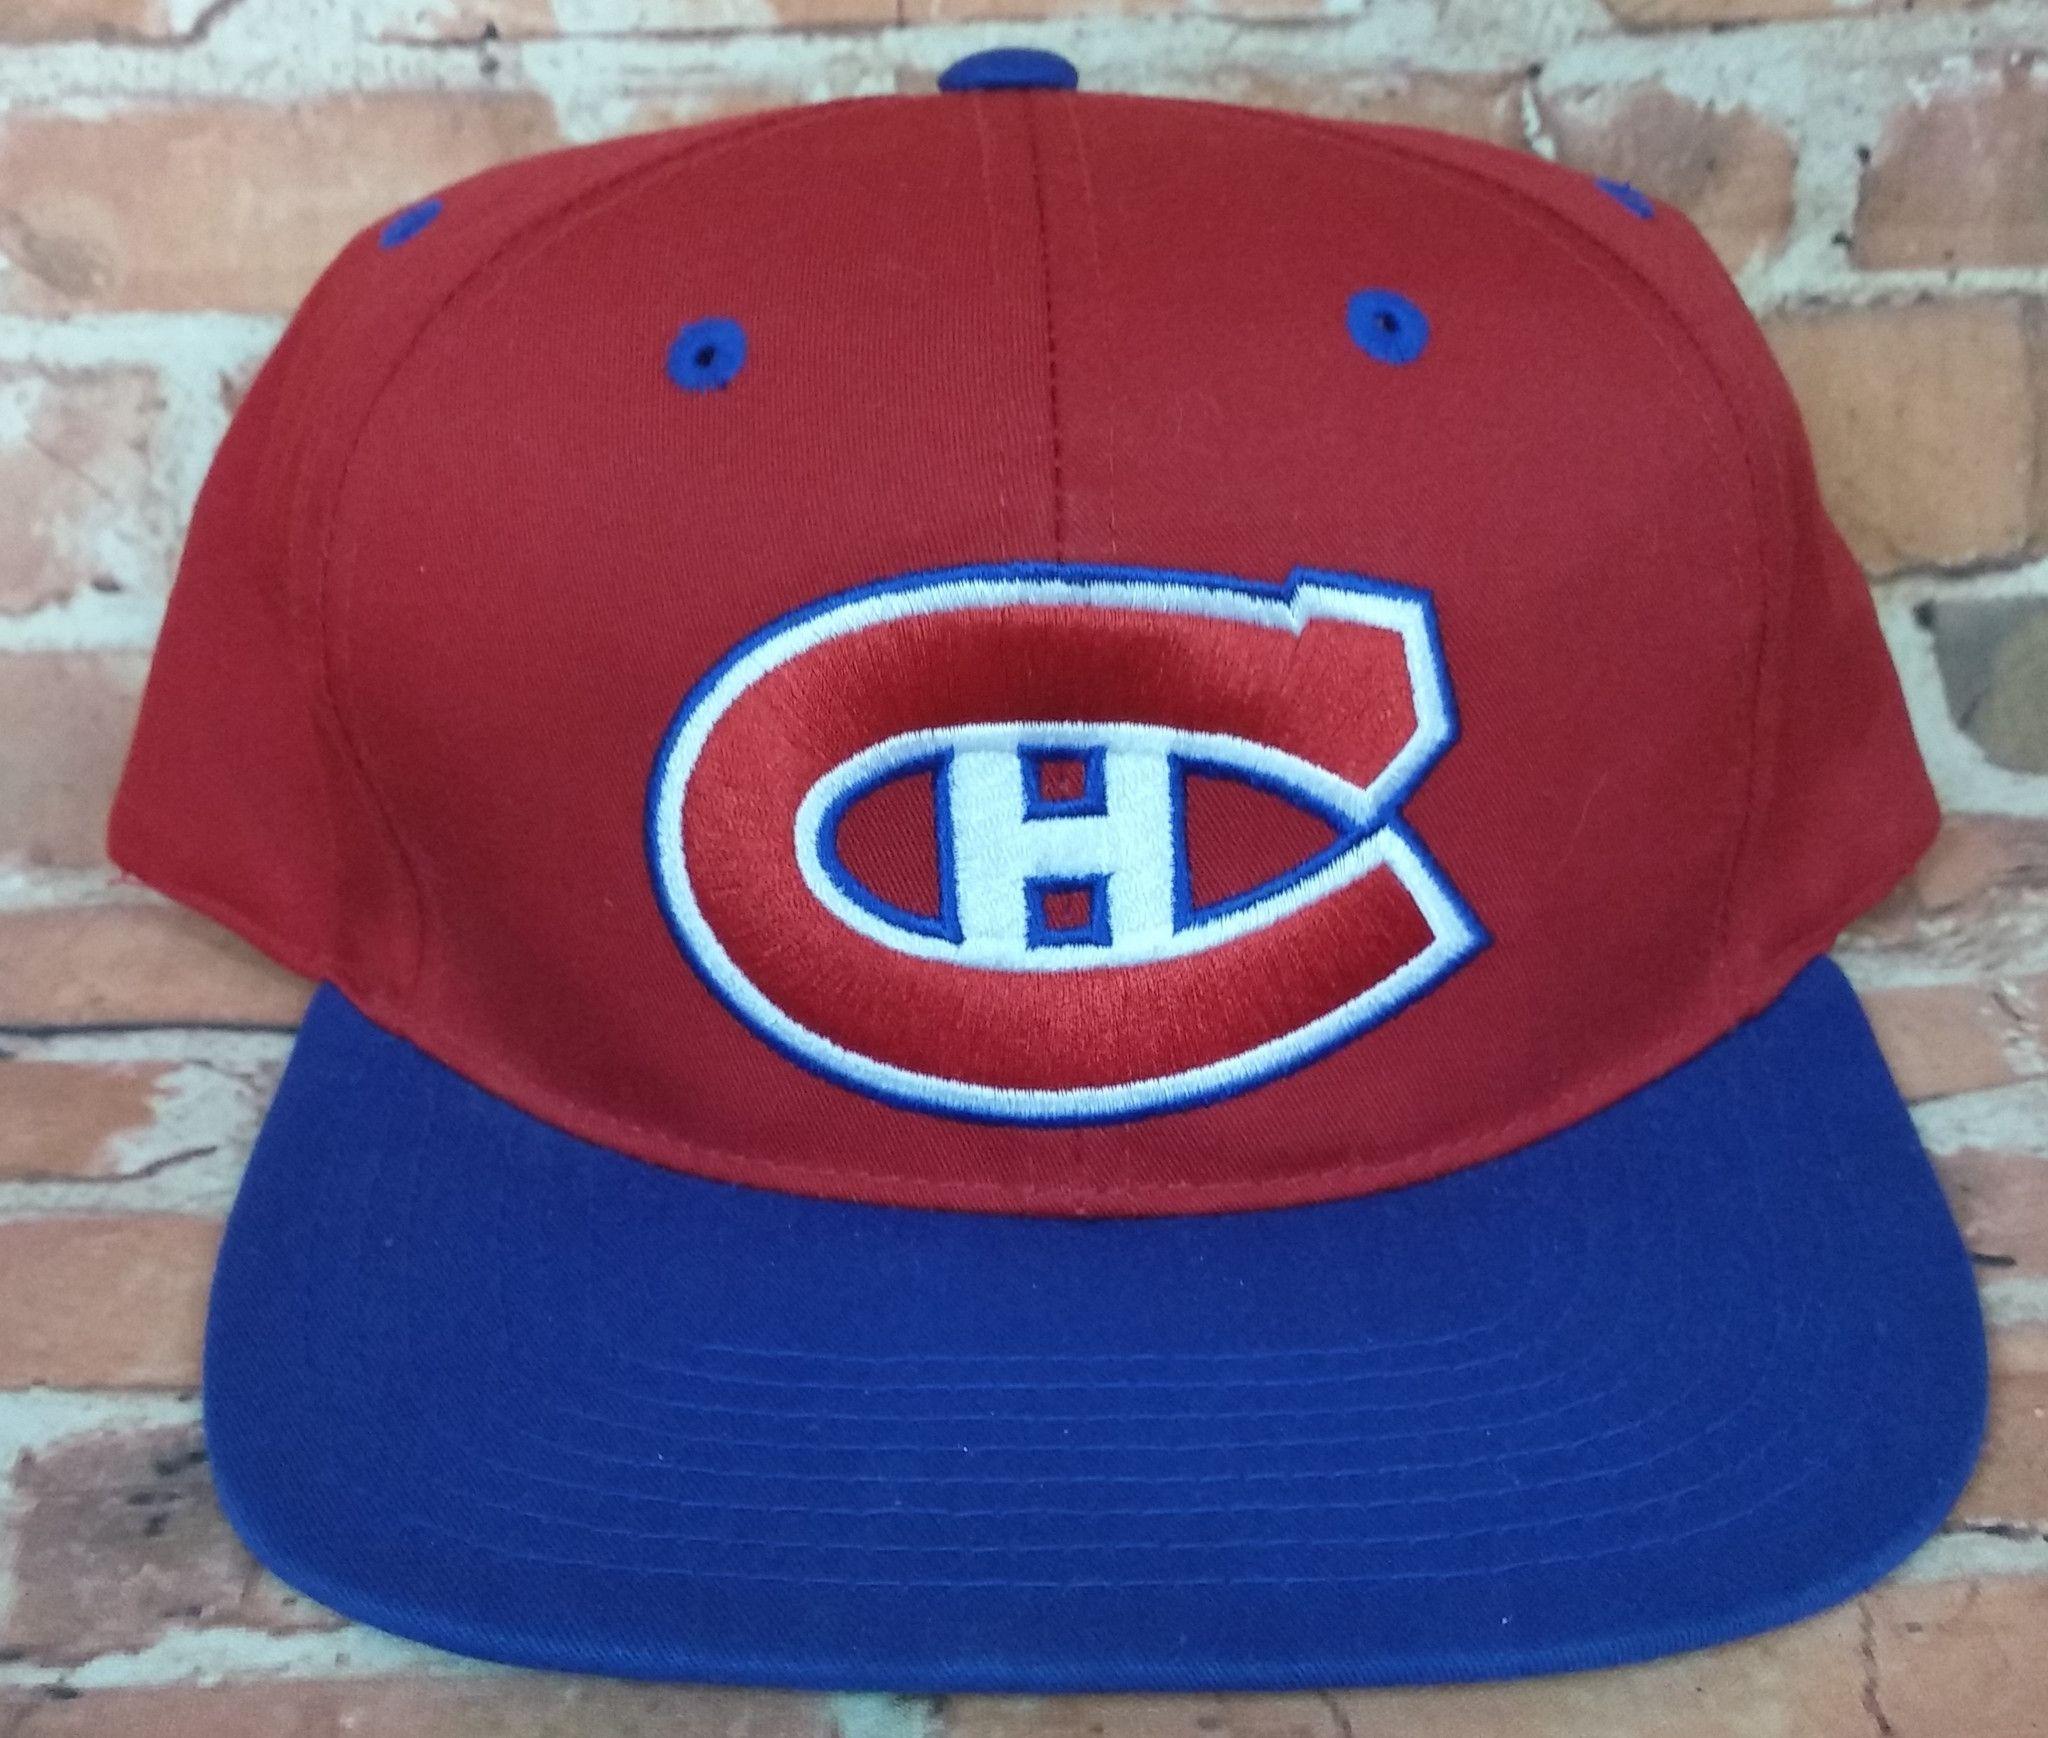 ... ireland montreal canadiens vintage snapback sports specialties plain  logo hat nhl rare 941df 9dd78 ... b19571d73